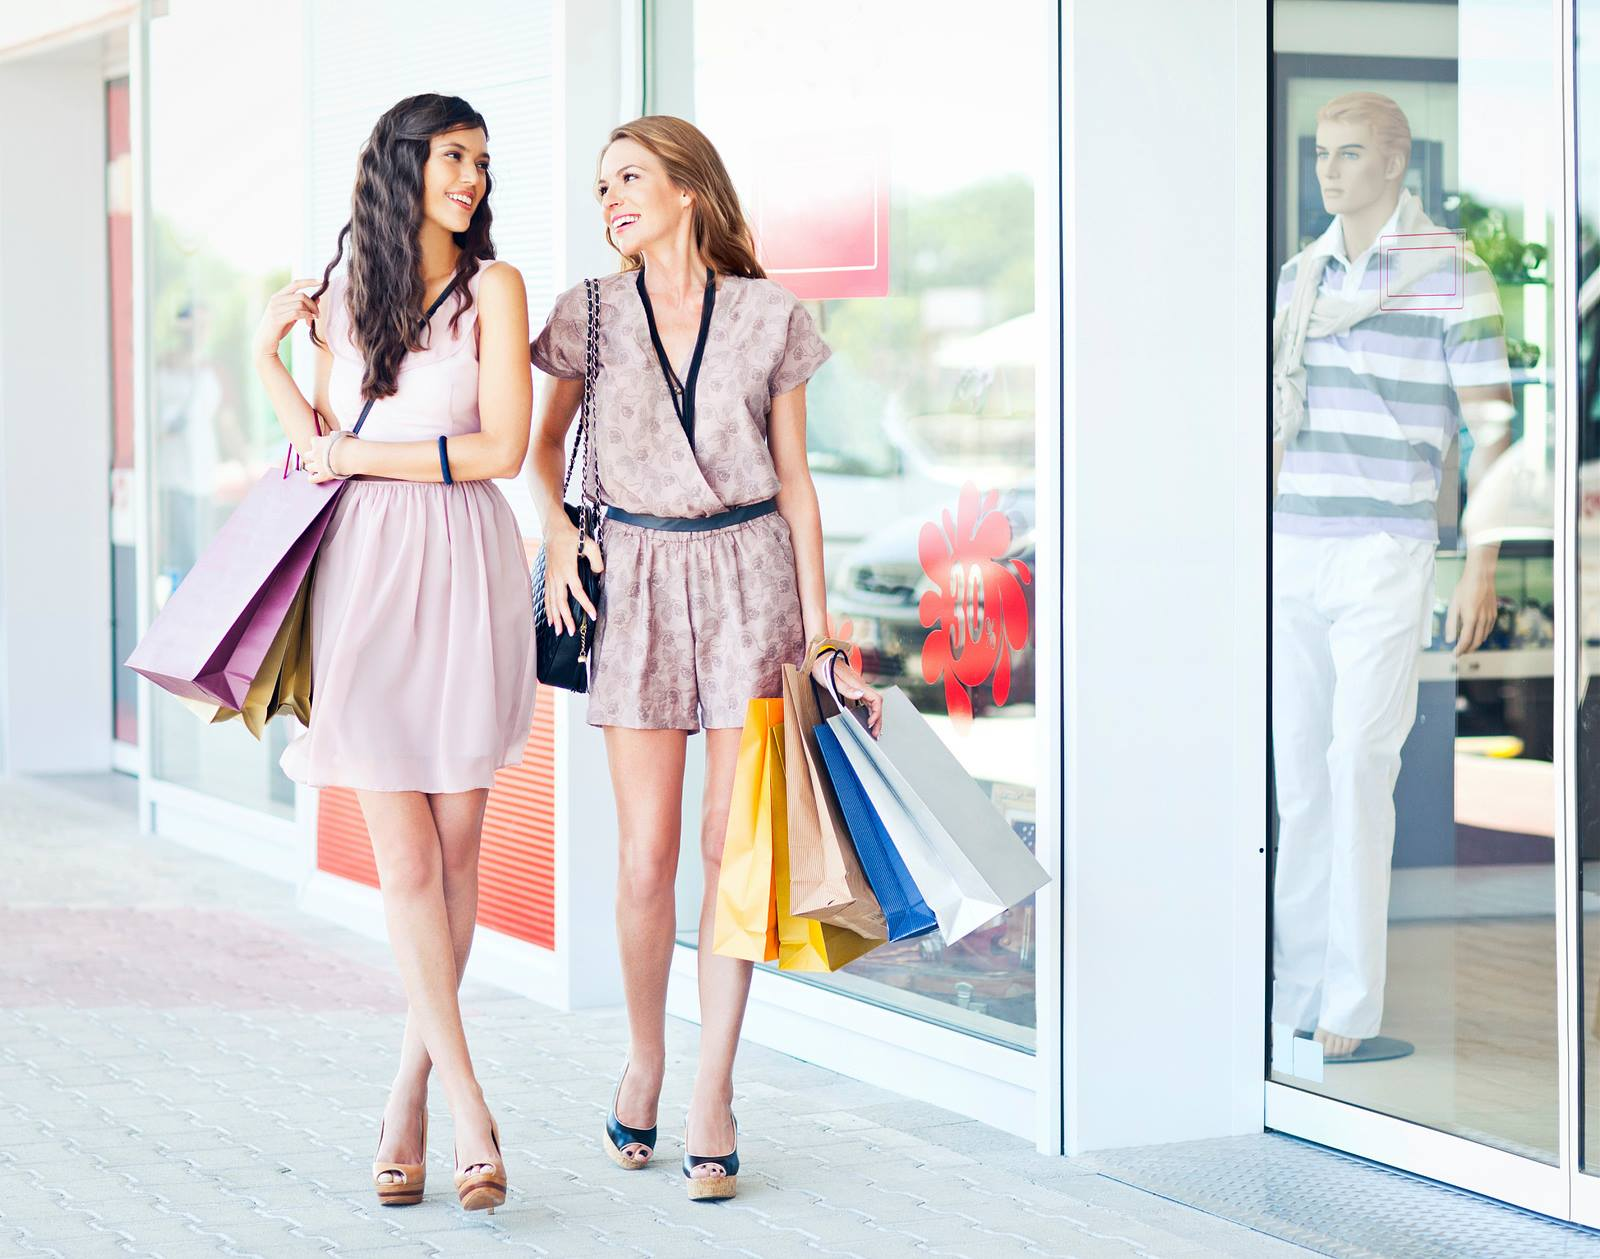 girls walking downtown port chester